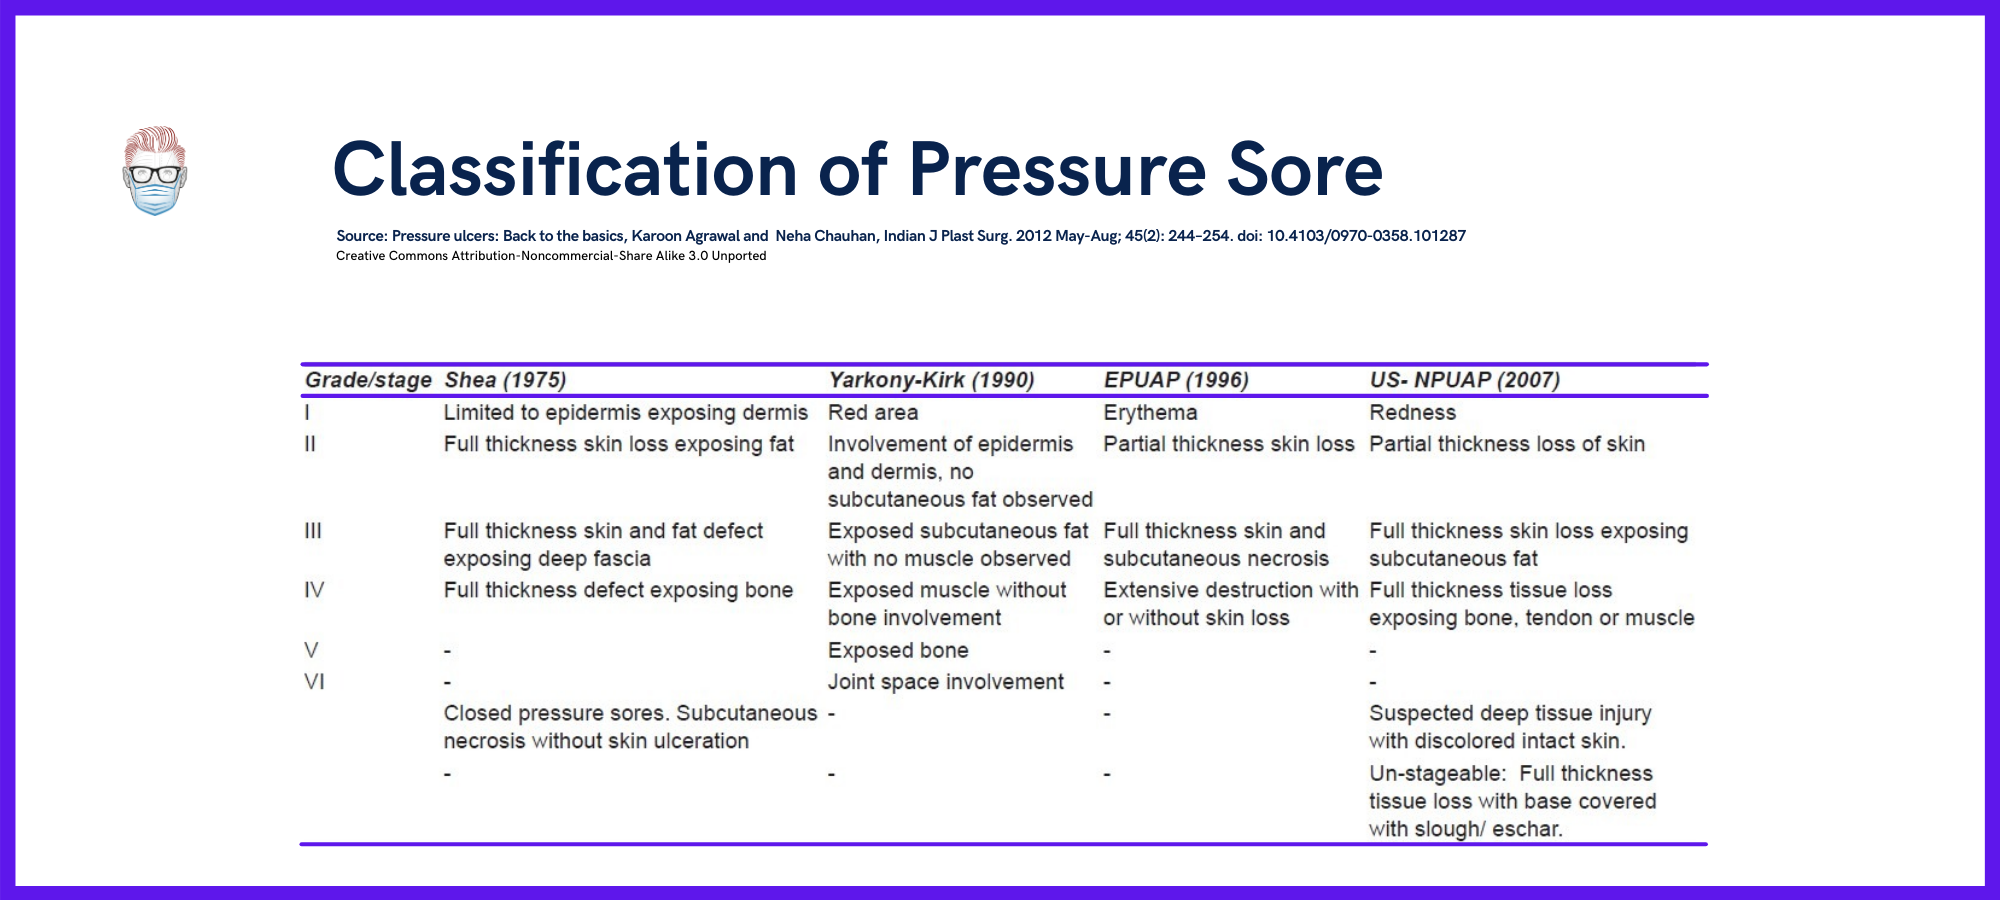 Classification of Pressure Sores, Ulcers, EPUAP, US-NPUAP